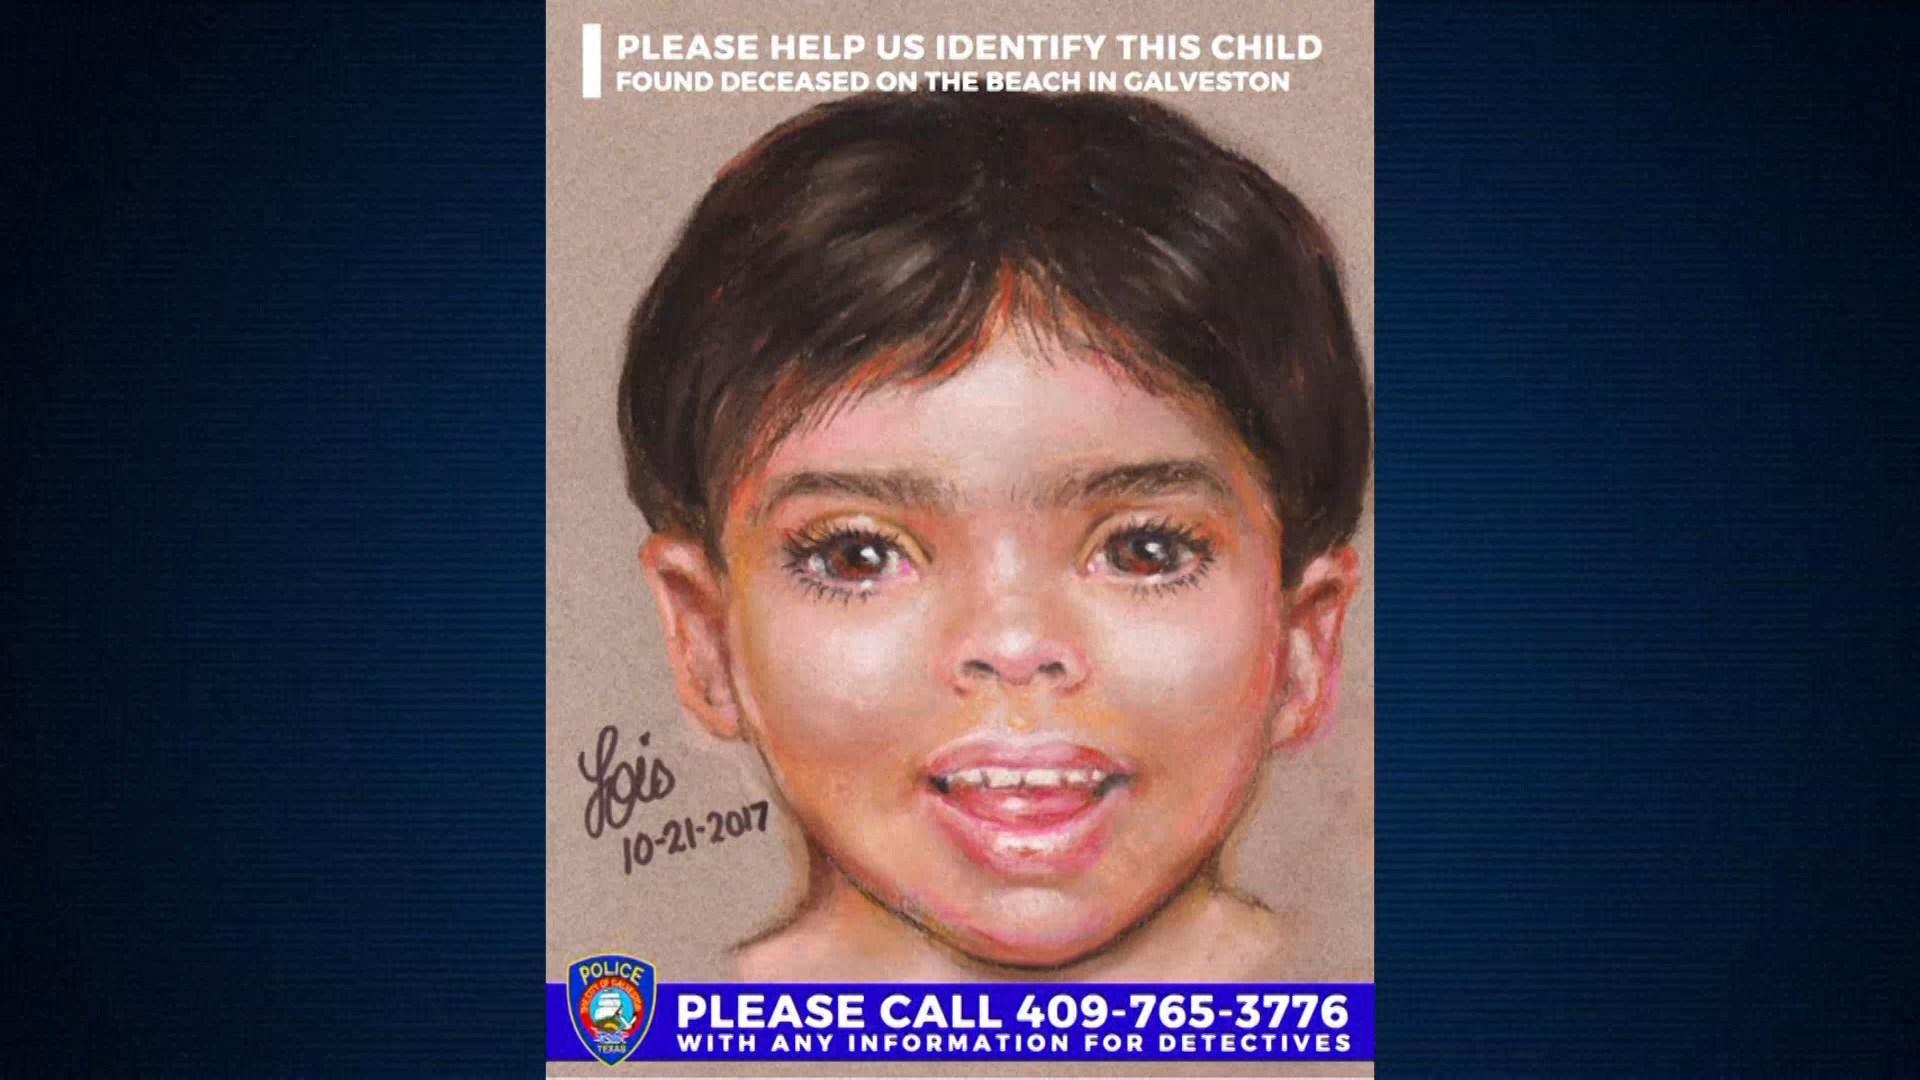 Young child found dead on Galveston beach